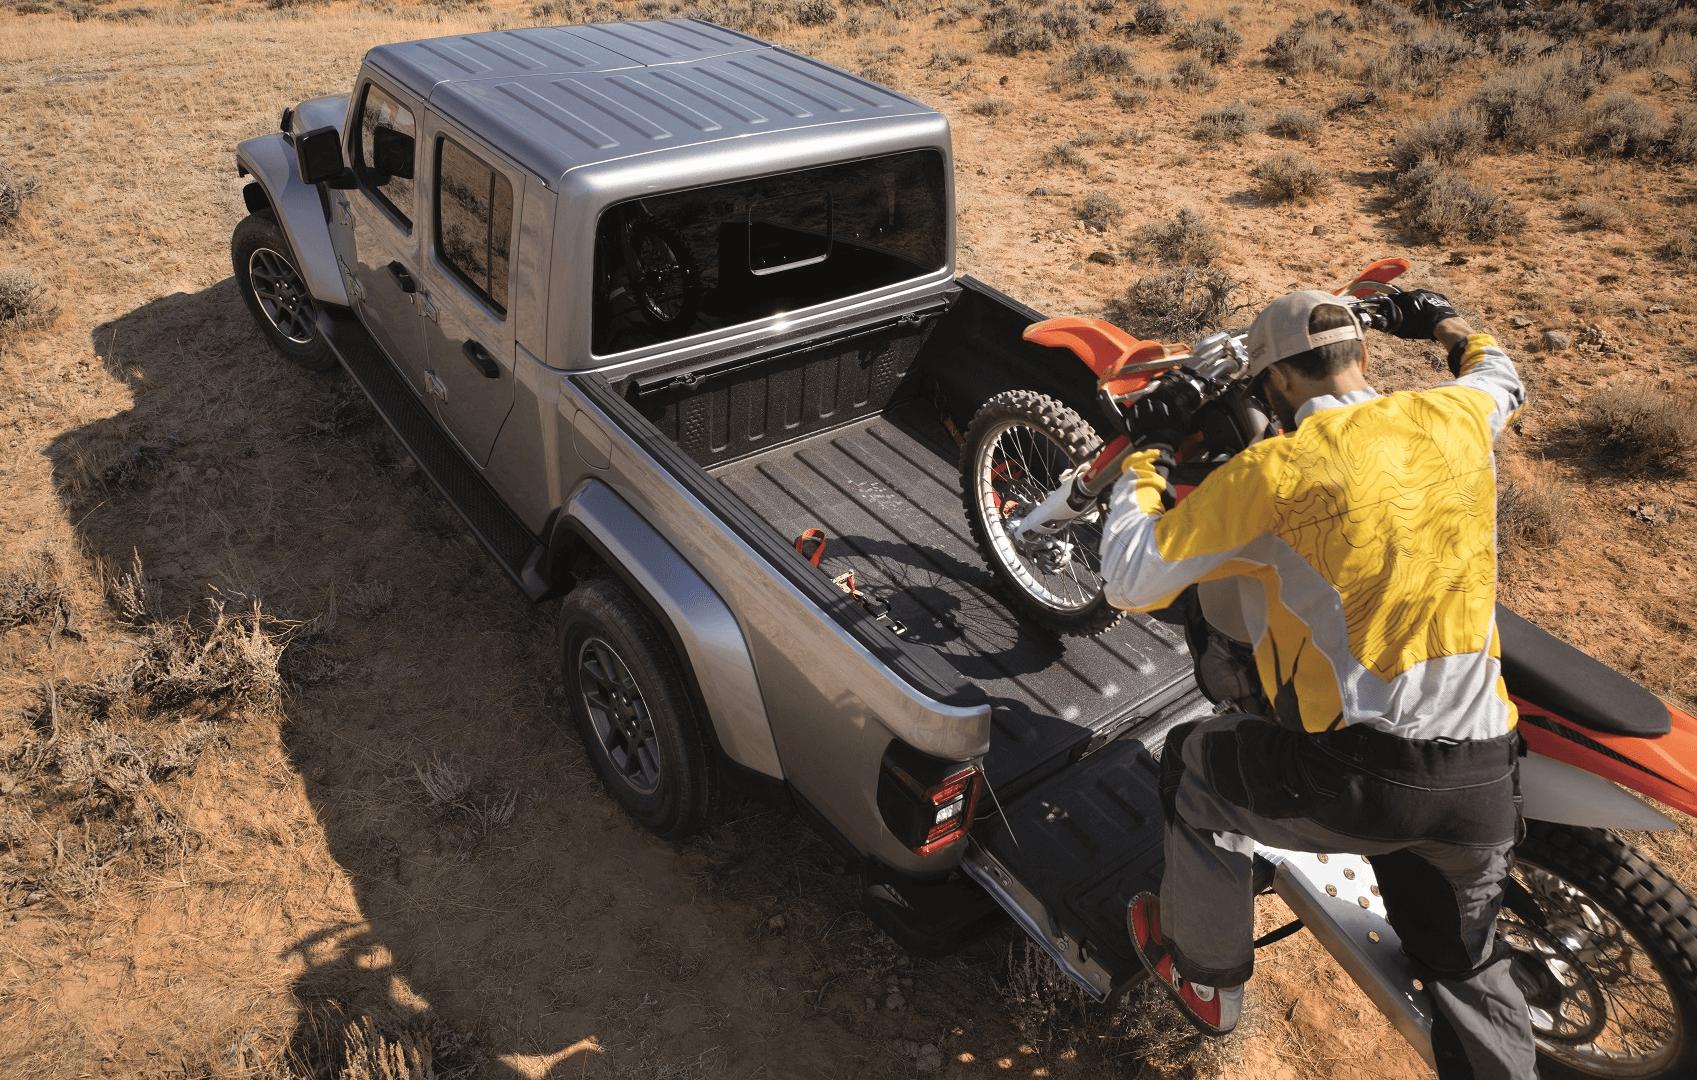 2020 Jeep Gladiator Hauling Dirt Bike